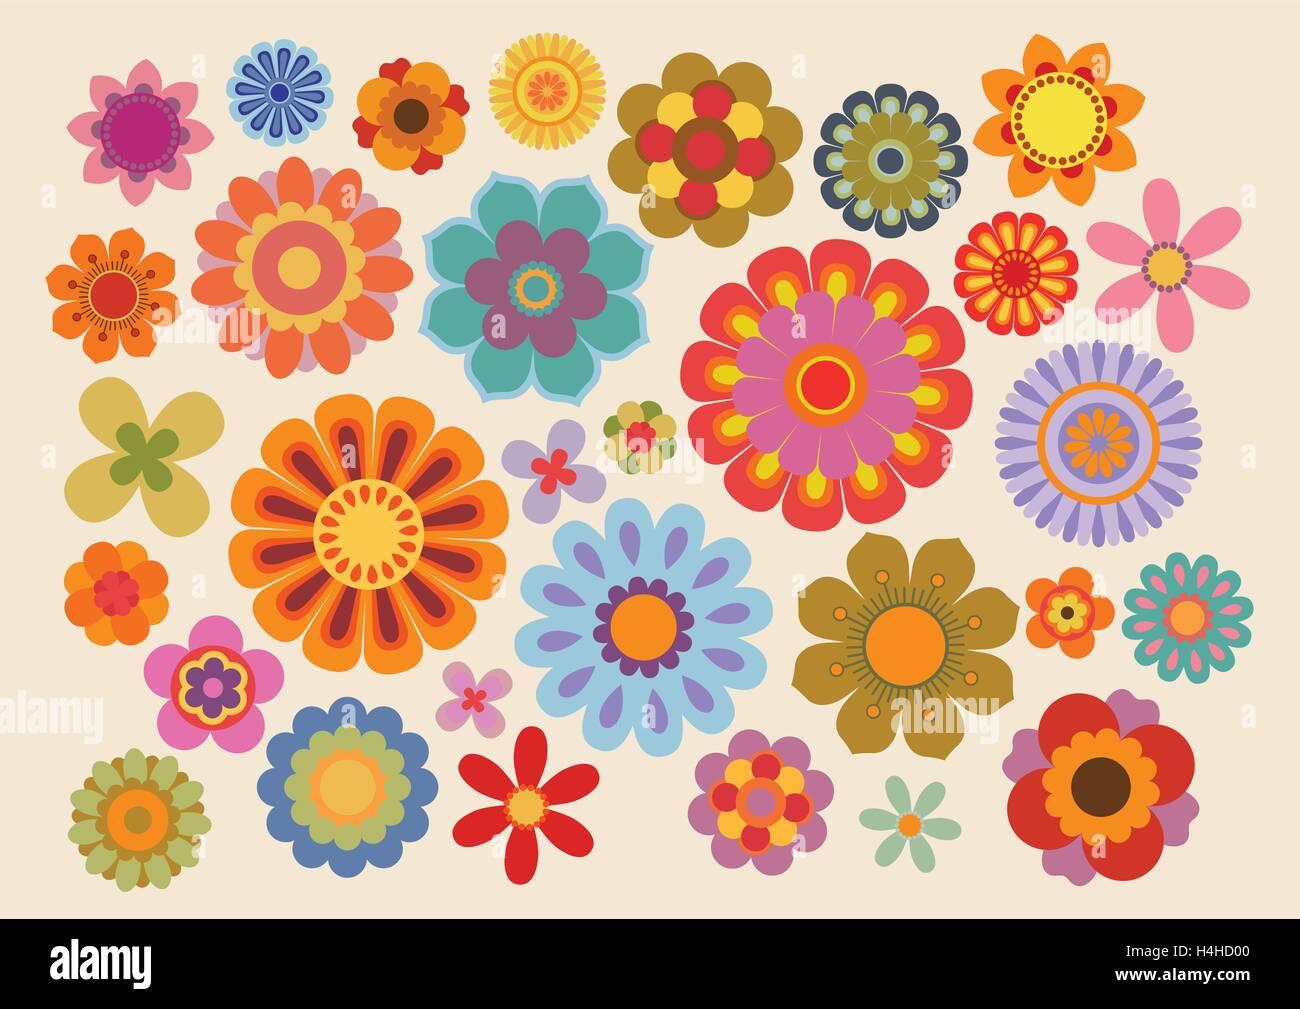 Vintage flowers (part 5) - Stock Image